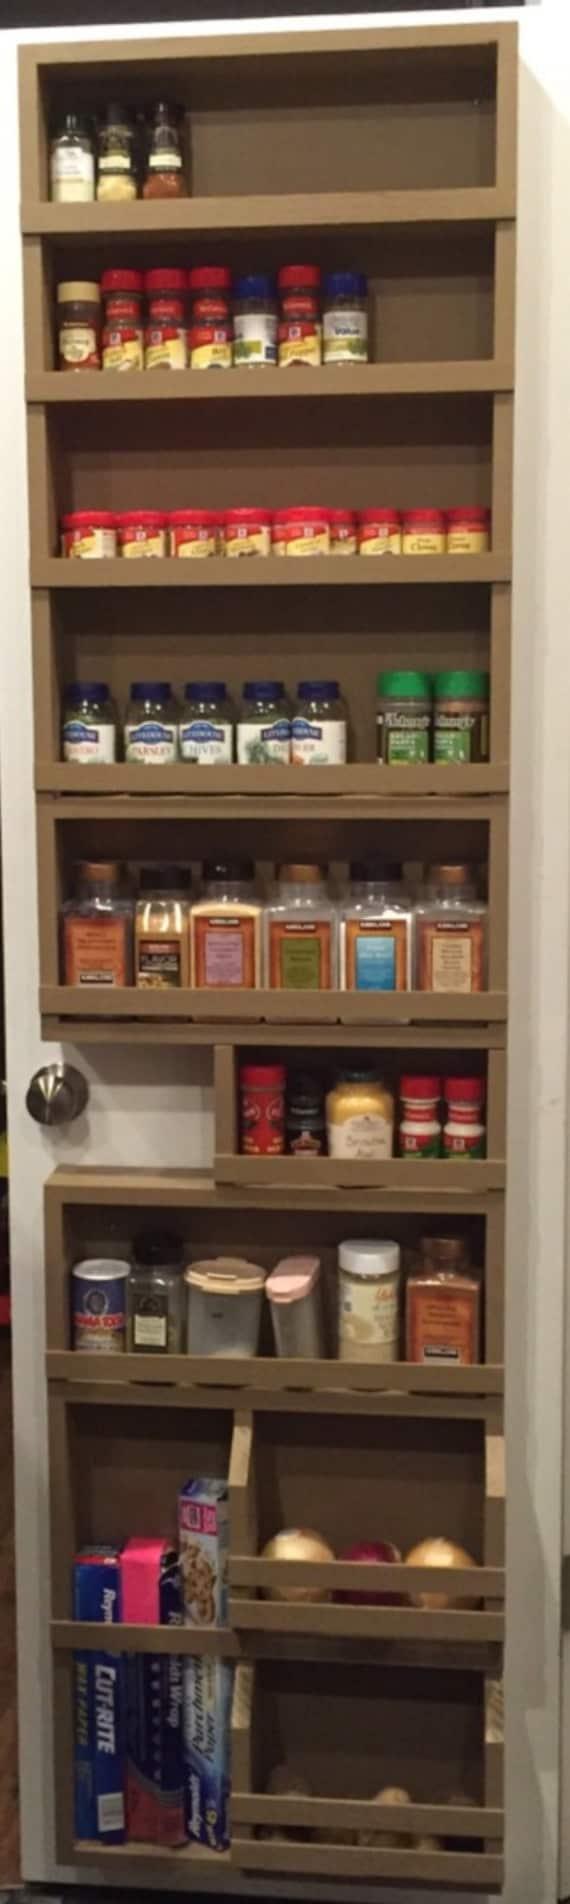 door pantry spice rack by waynestruction on etsy